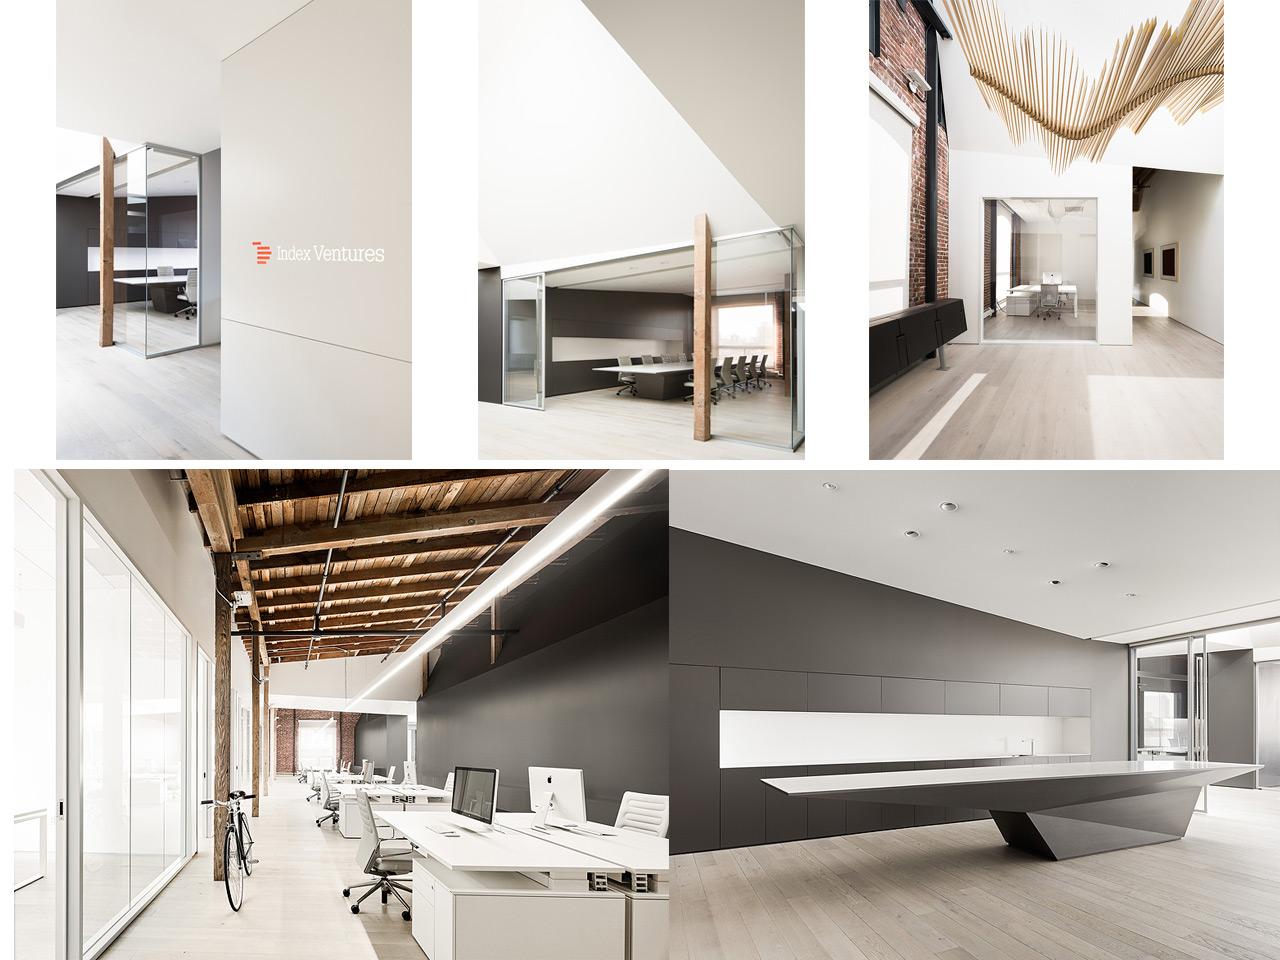 5 tendencias de arquitectura de oficinas modernas for Oficinas de arquitectura